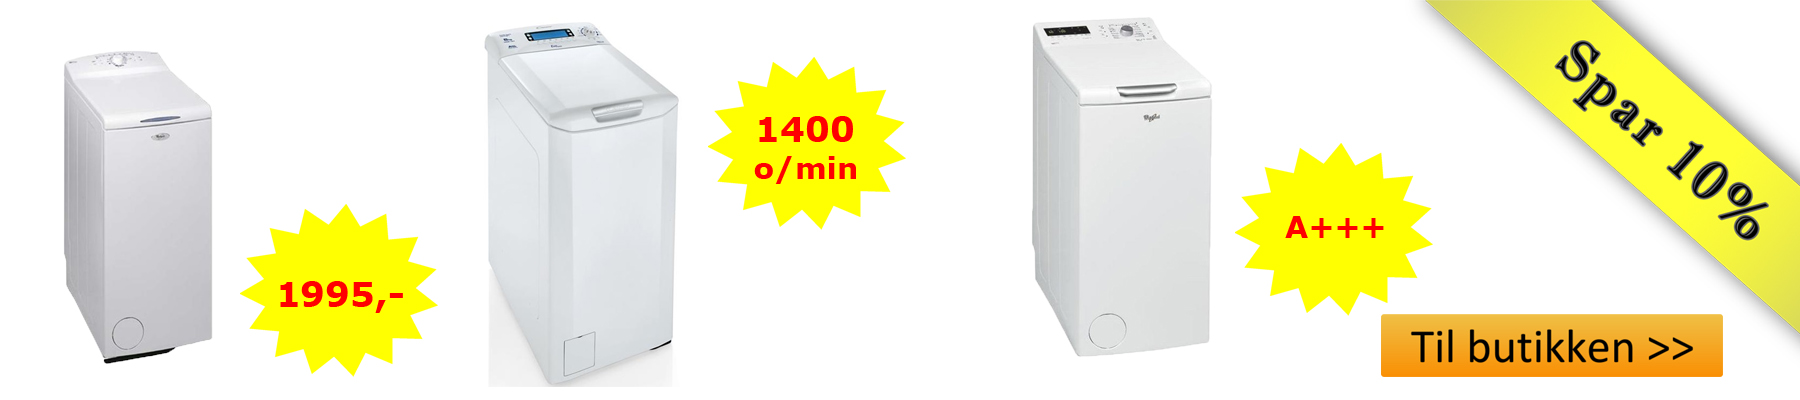 topbetjent vaskemaskine tilbud